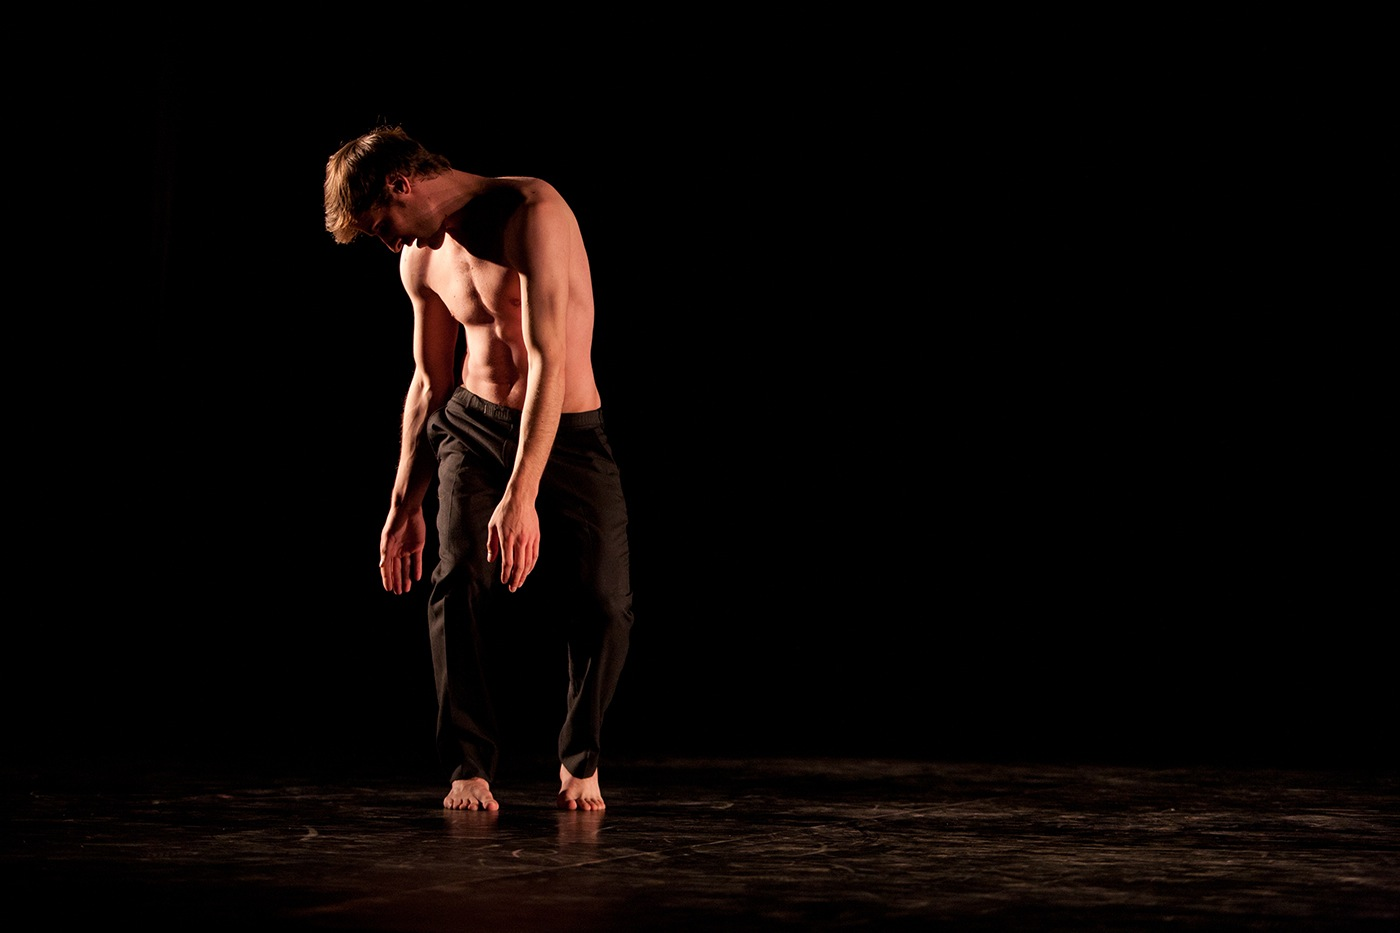 photographe-reportage-danse-avec-ton-crous-guillaume-heraud-031-small